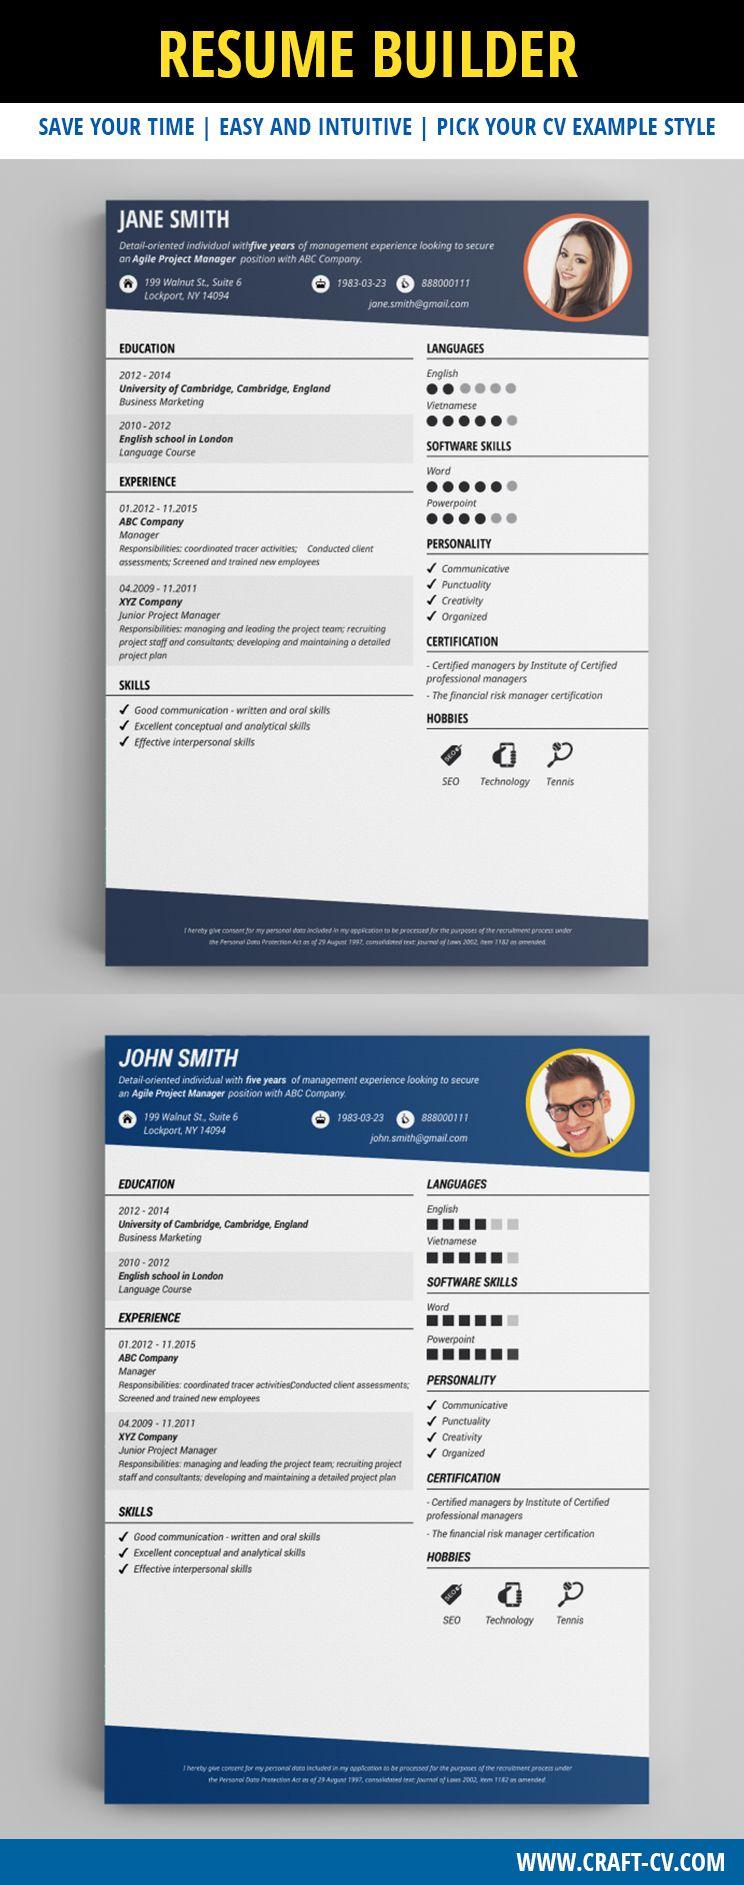 Modern Resume Example #modernresume #resume #cv | Creative CV ...